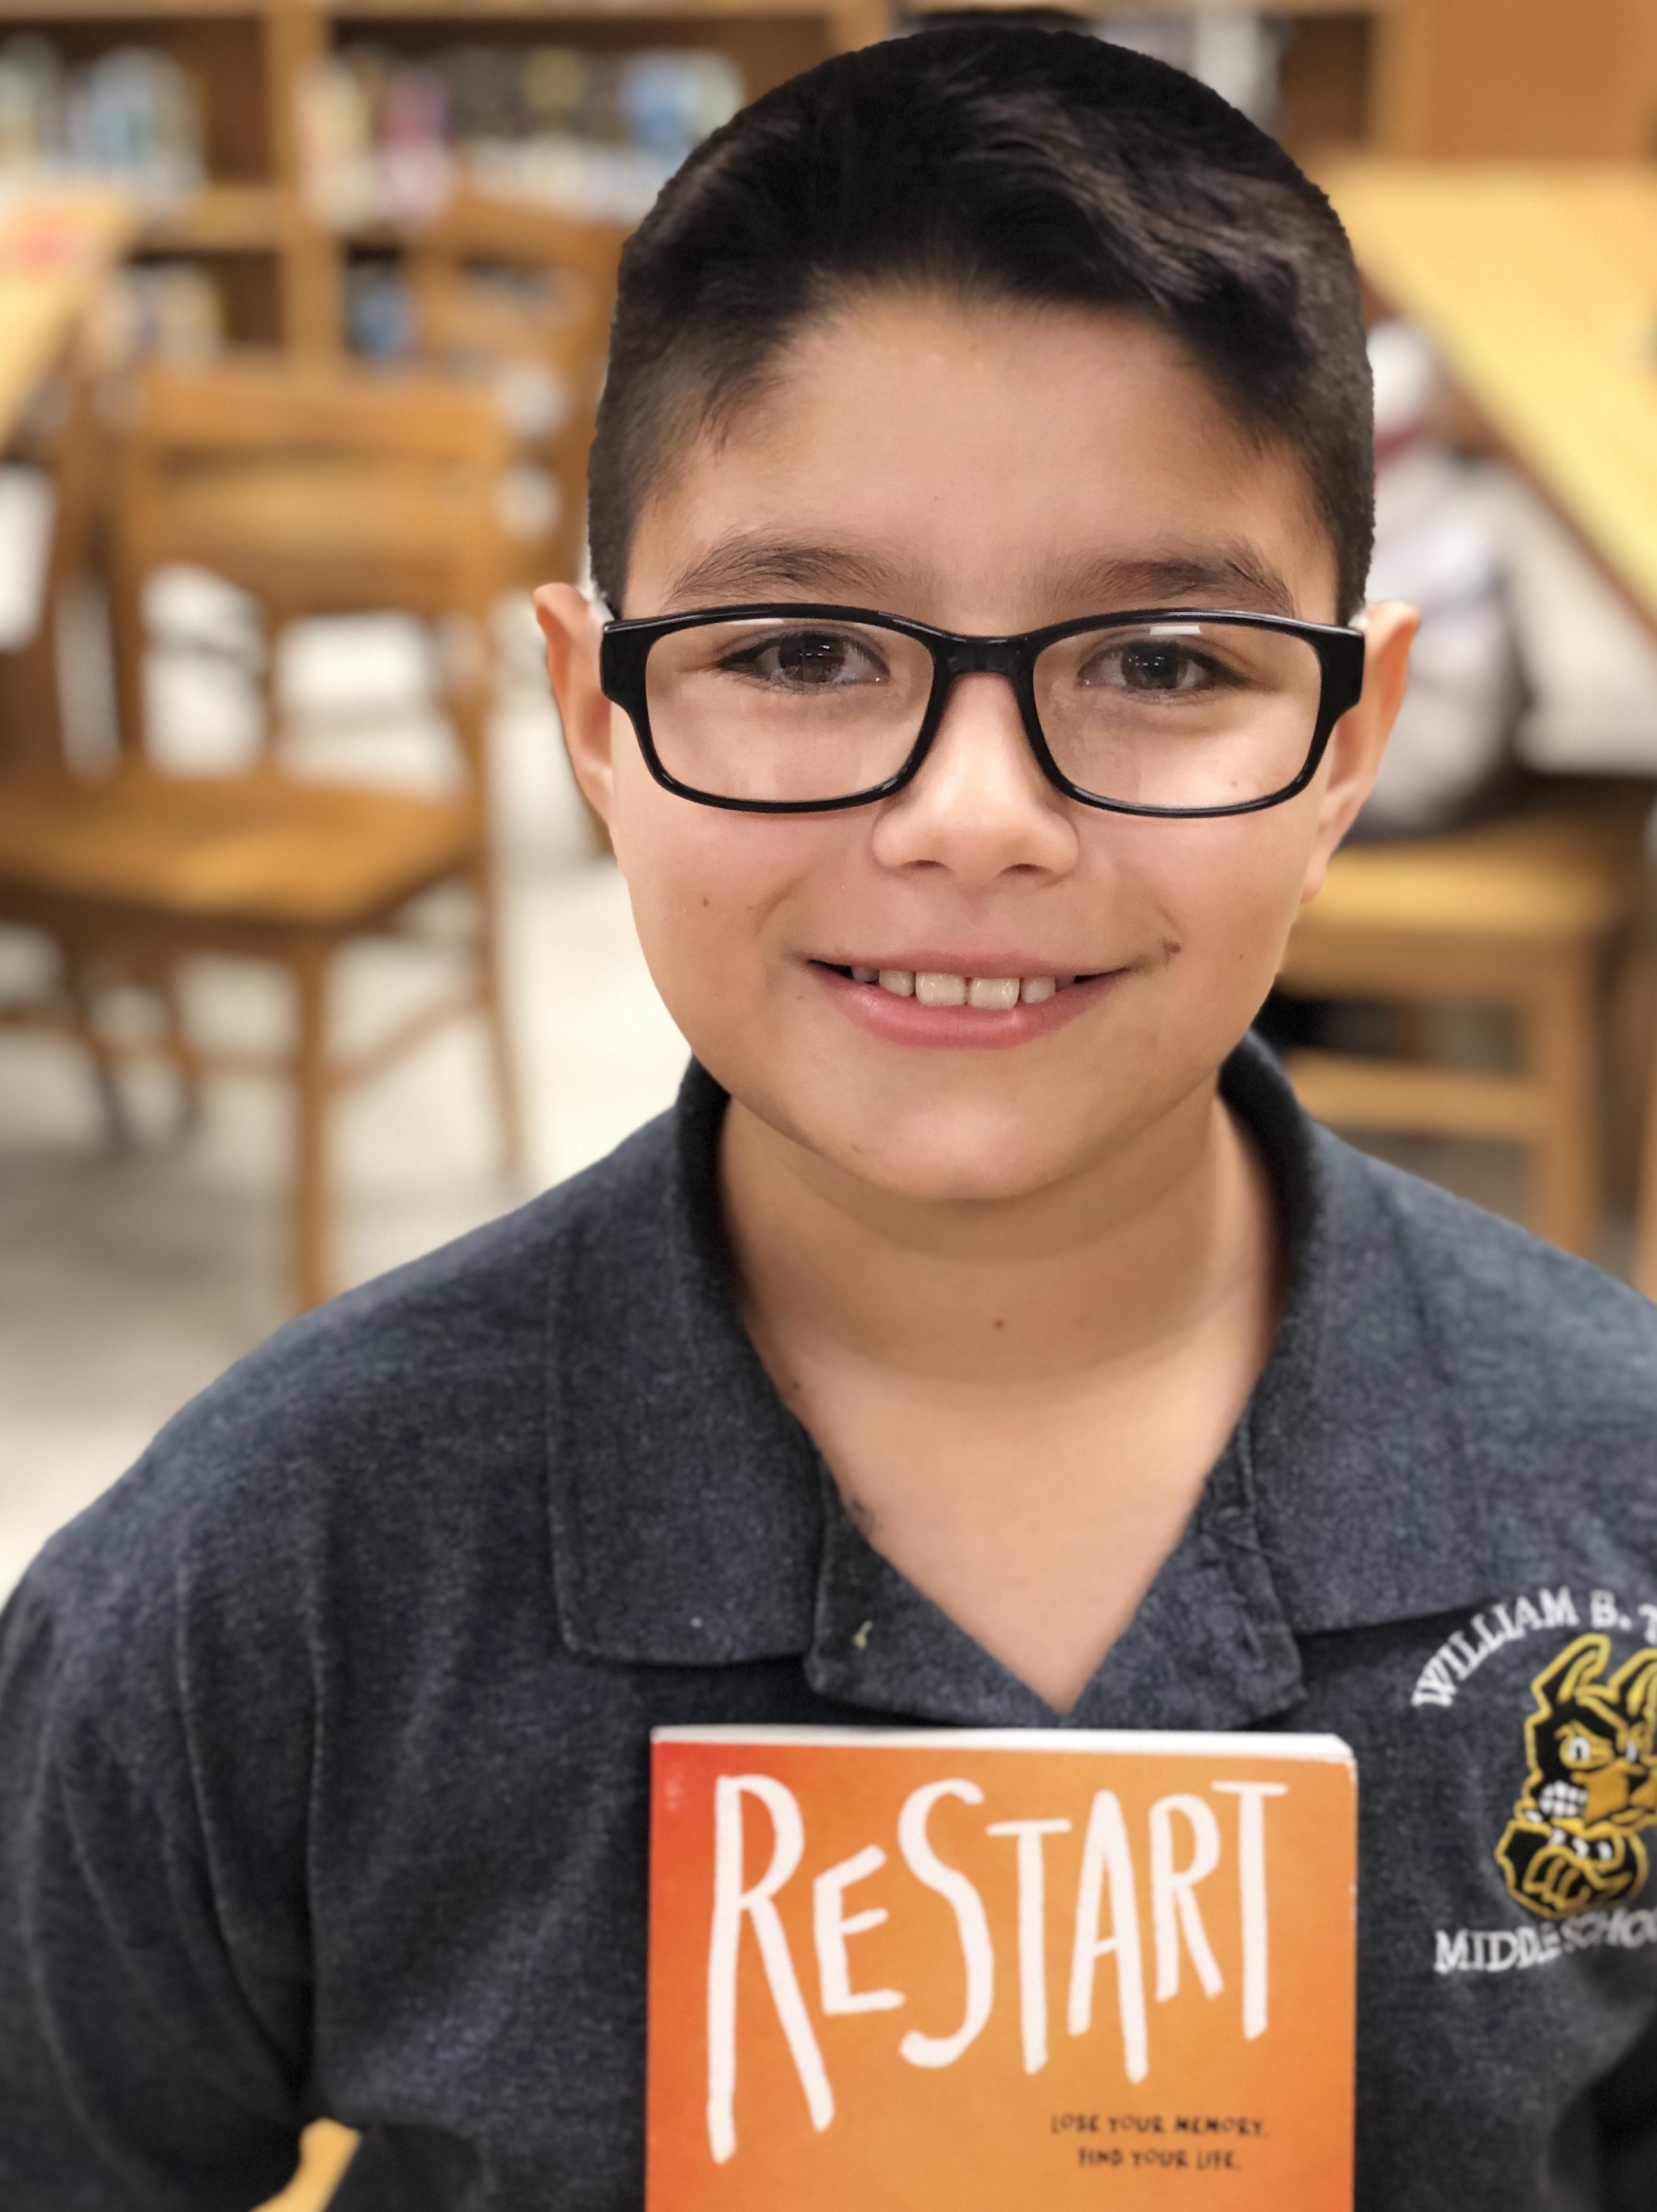 Boy holding a book title.